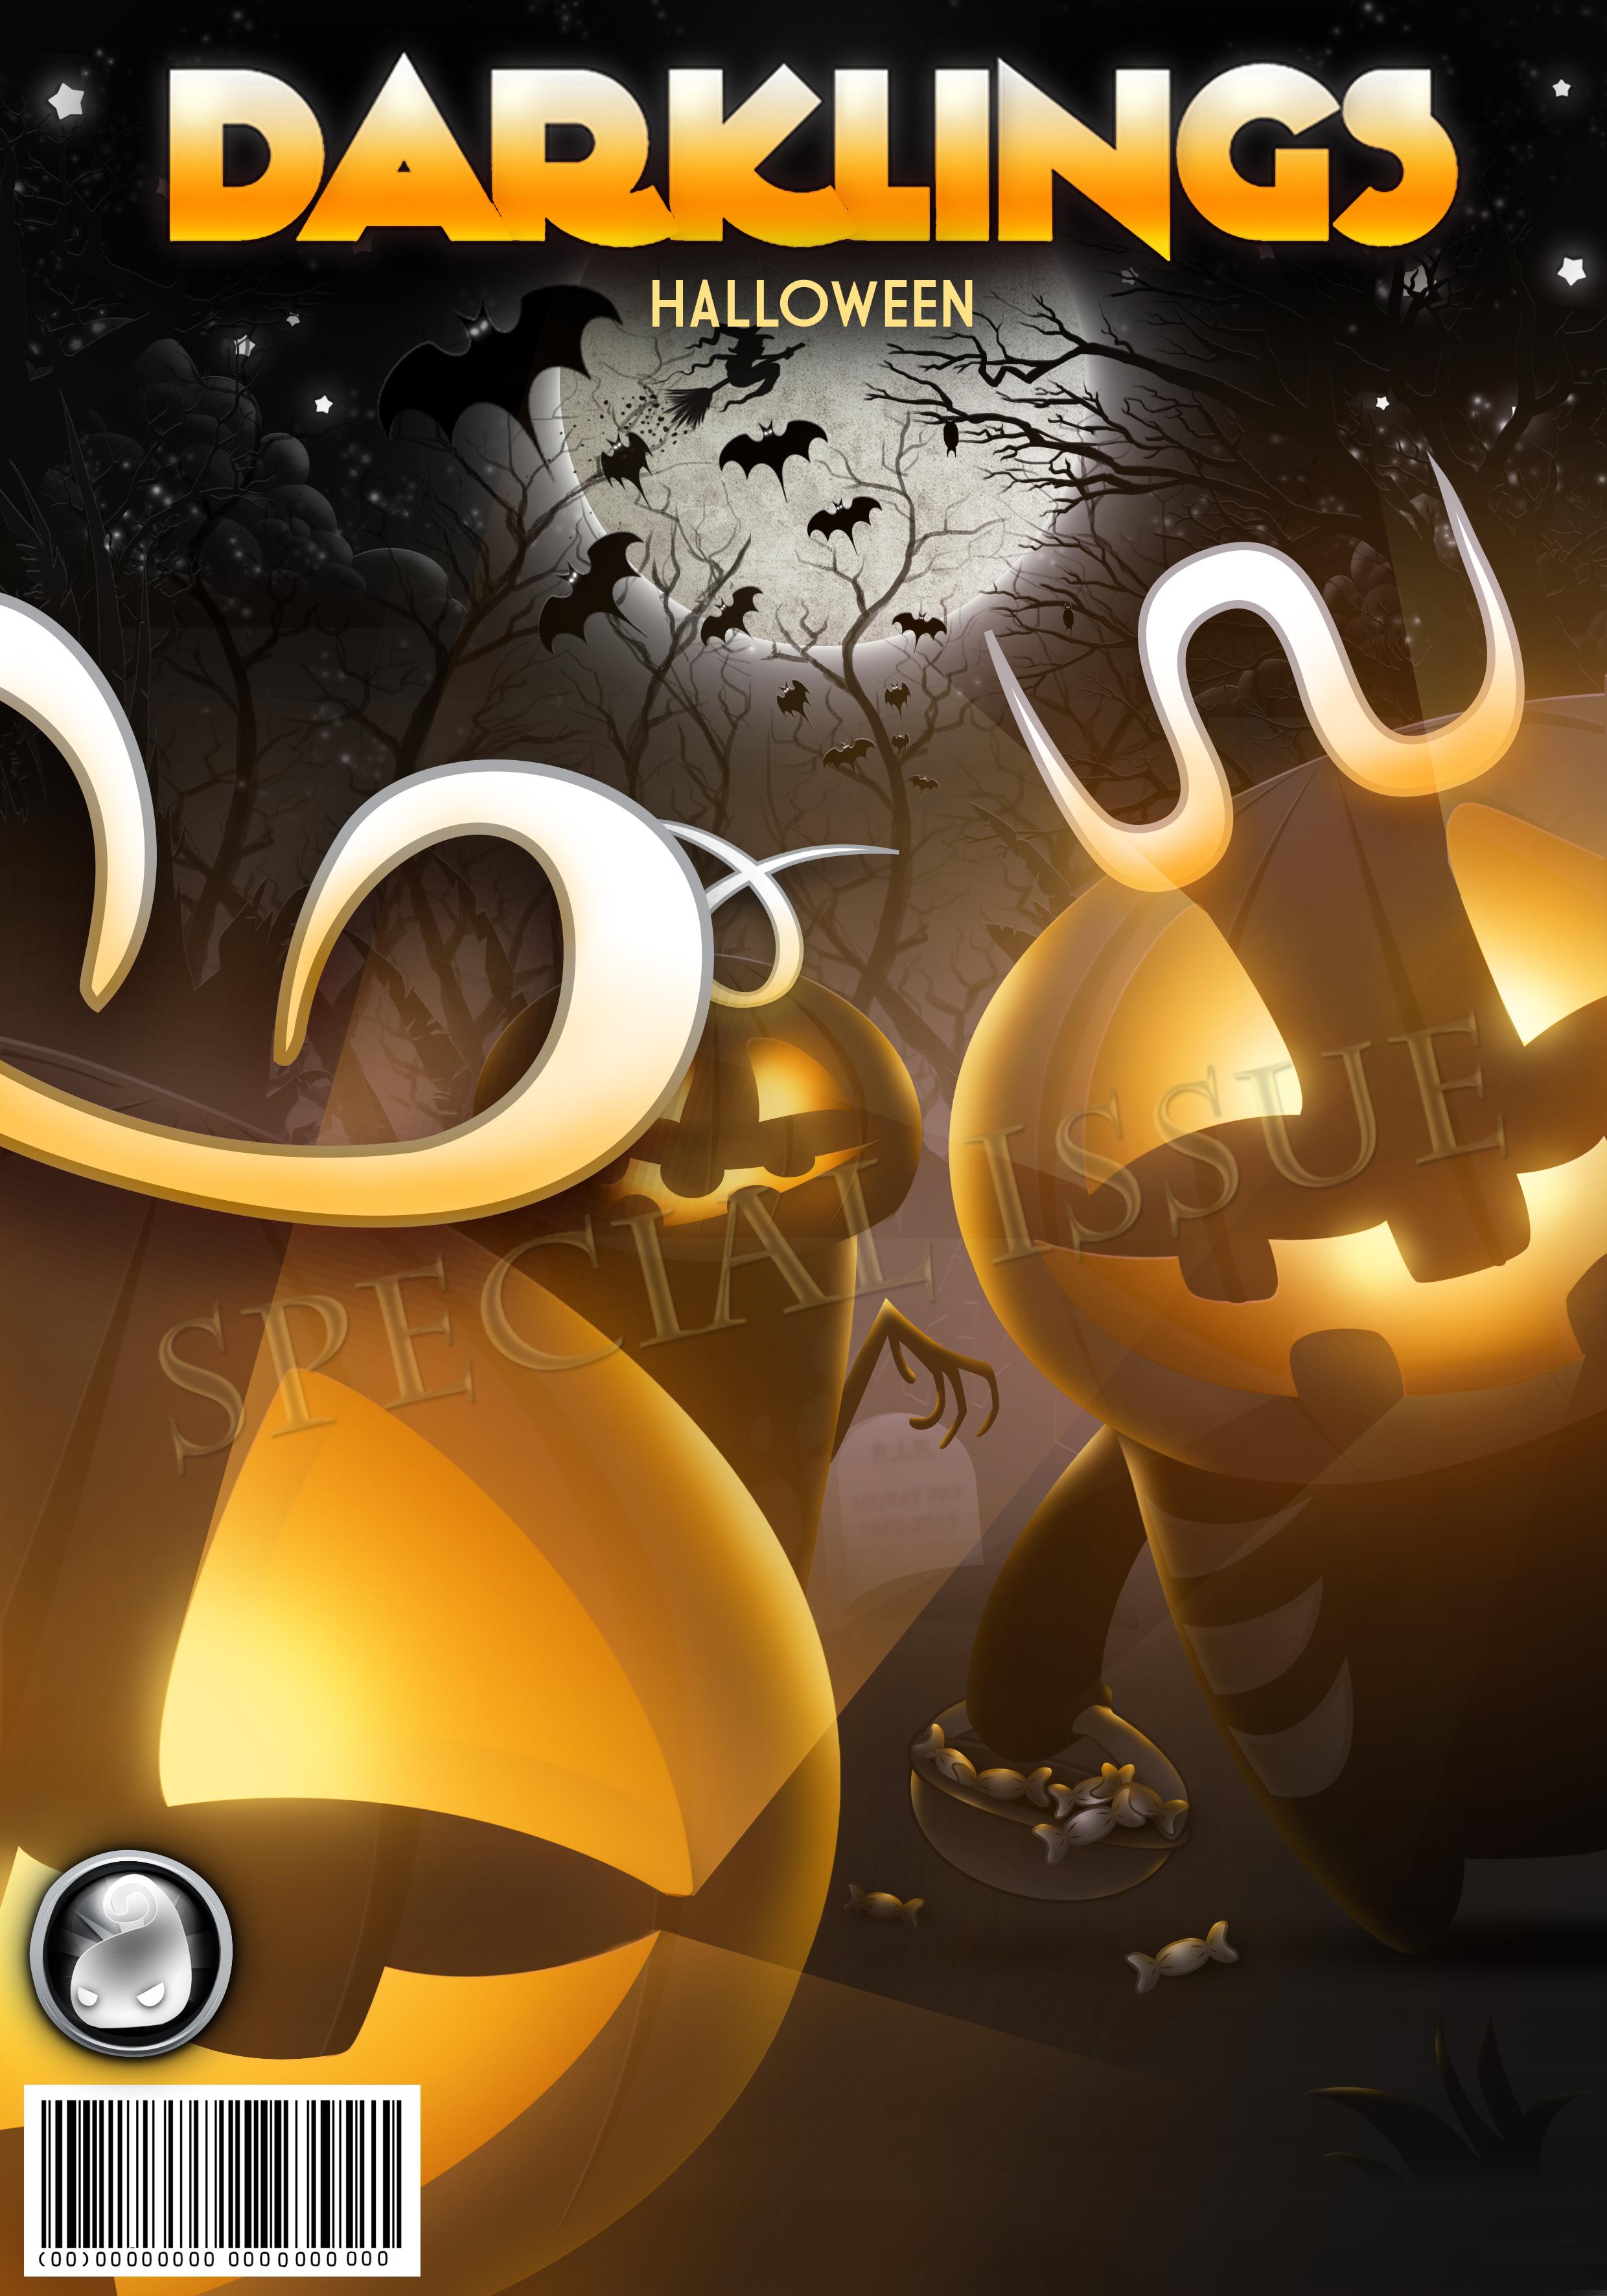 Darklings_Halloween.jpg